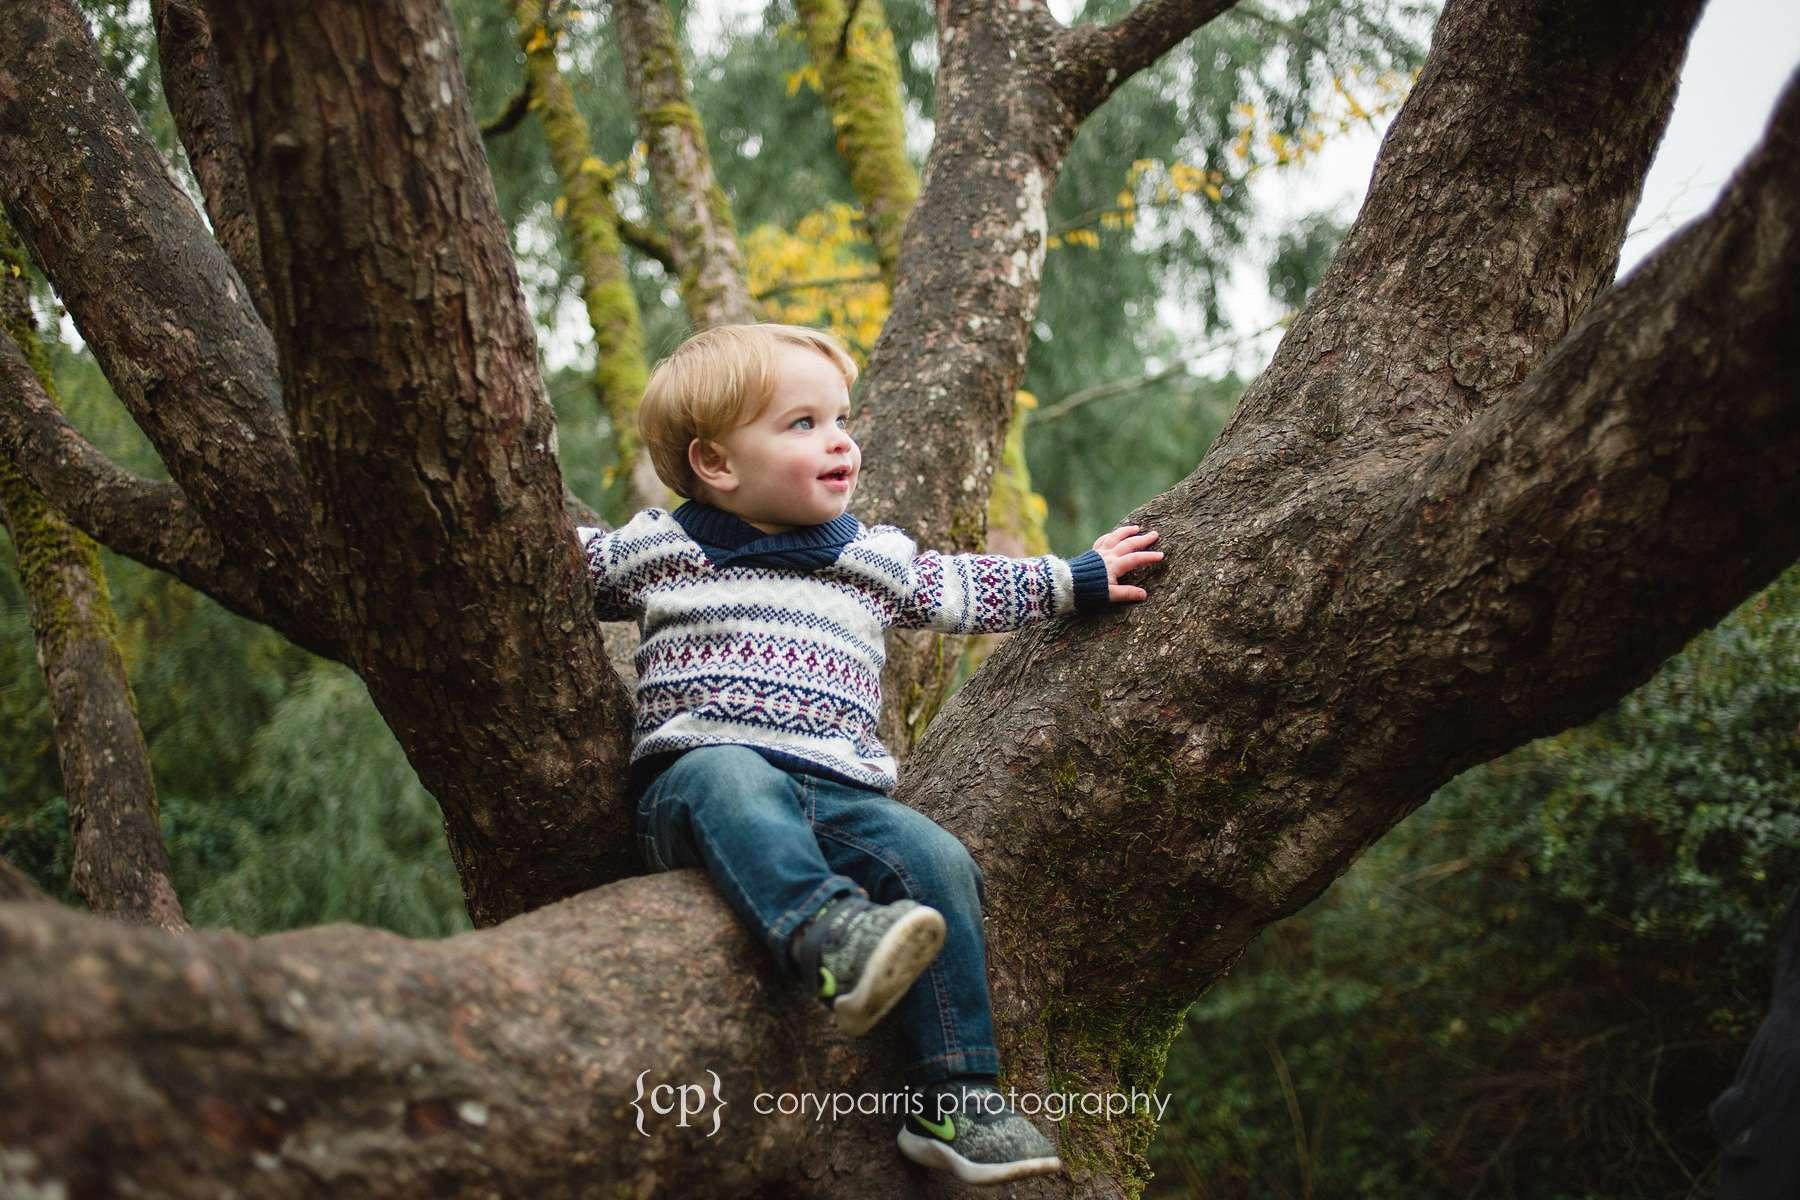 Little boy in a tree at Washington Park Arboretum